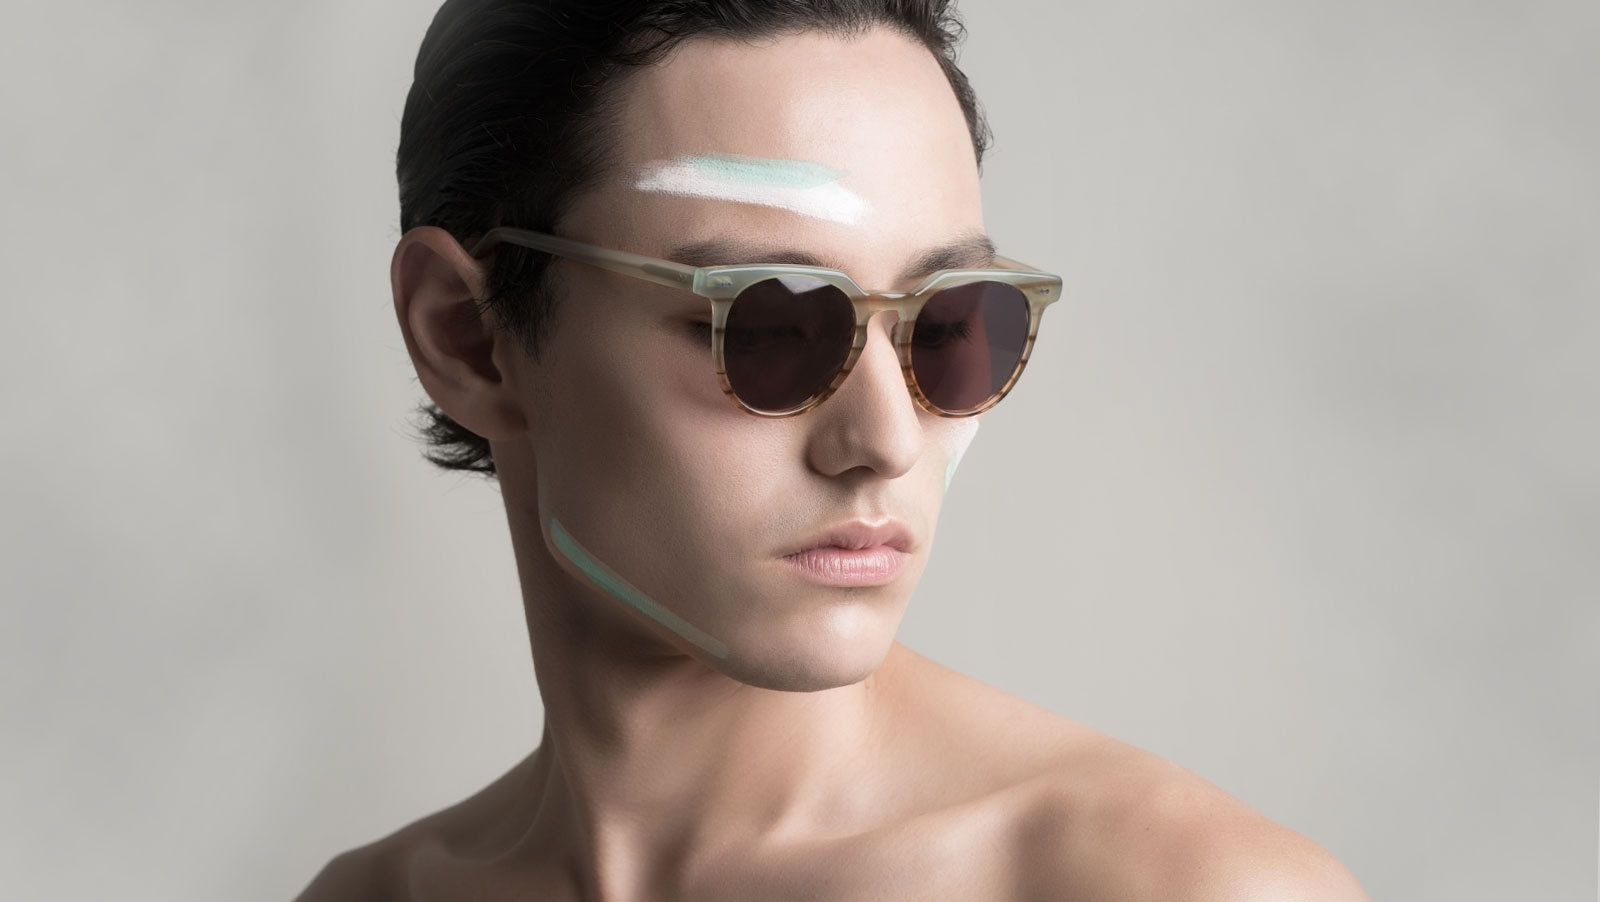 paint on model wearing clear eyeglasses